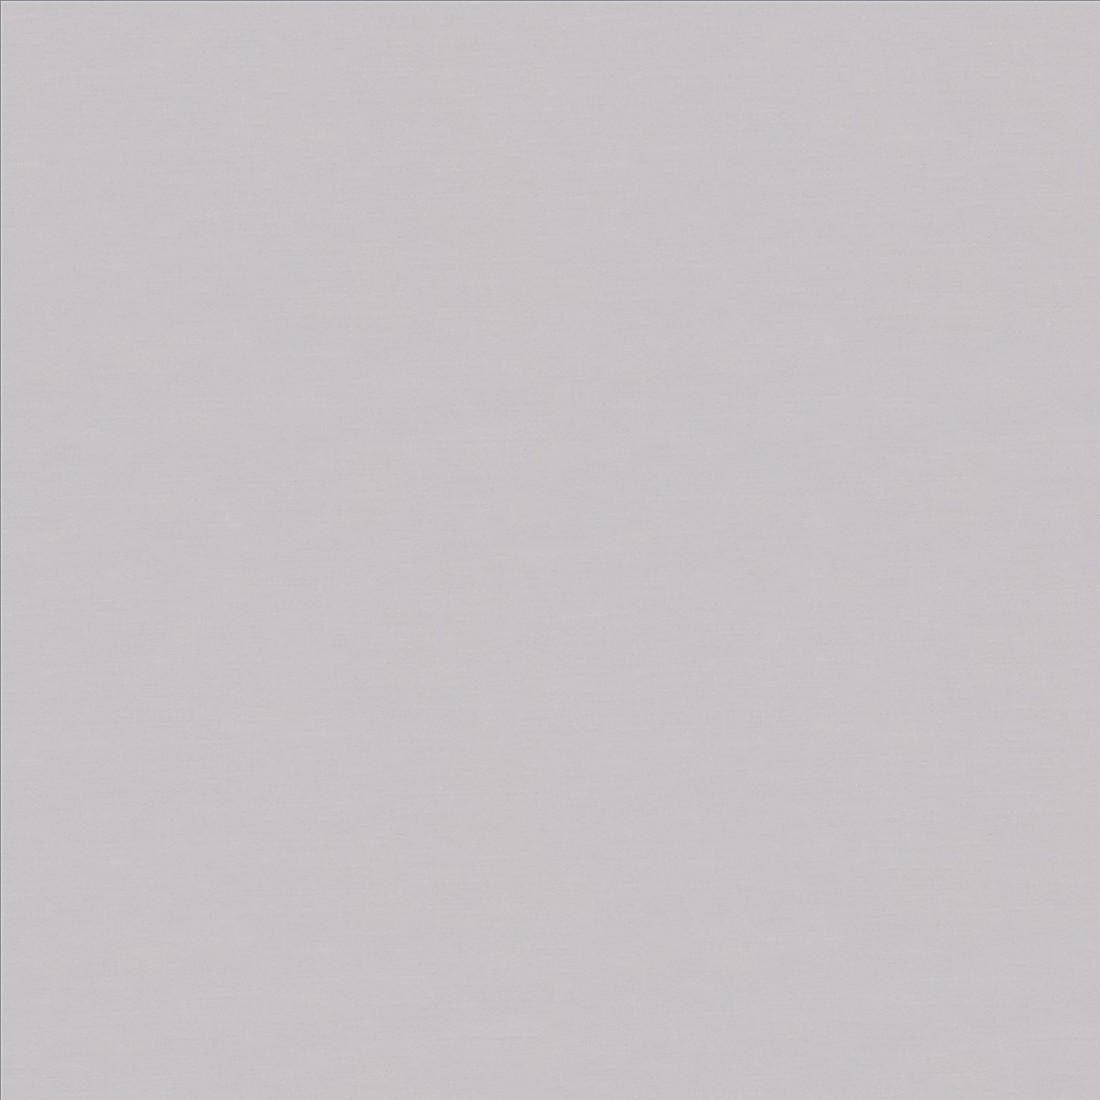 Serviette Combo (4er-Set) – Kitt, Villeroy&Boch günstig kaufen